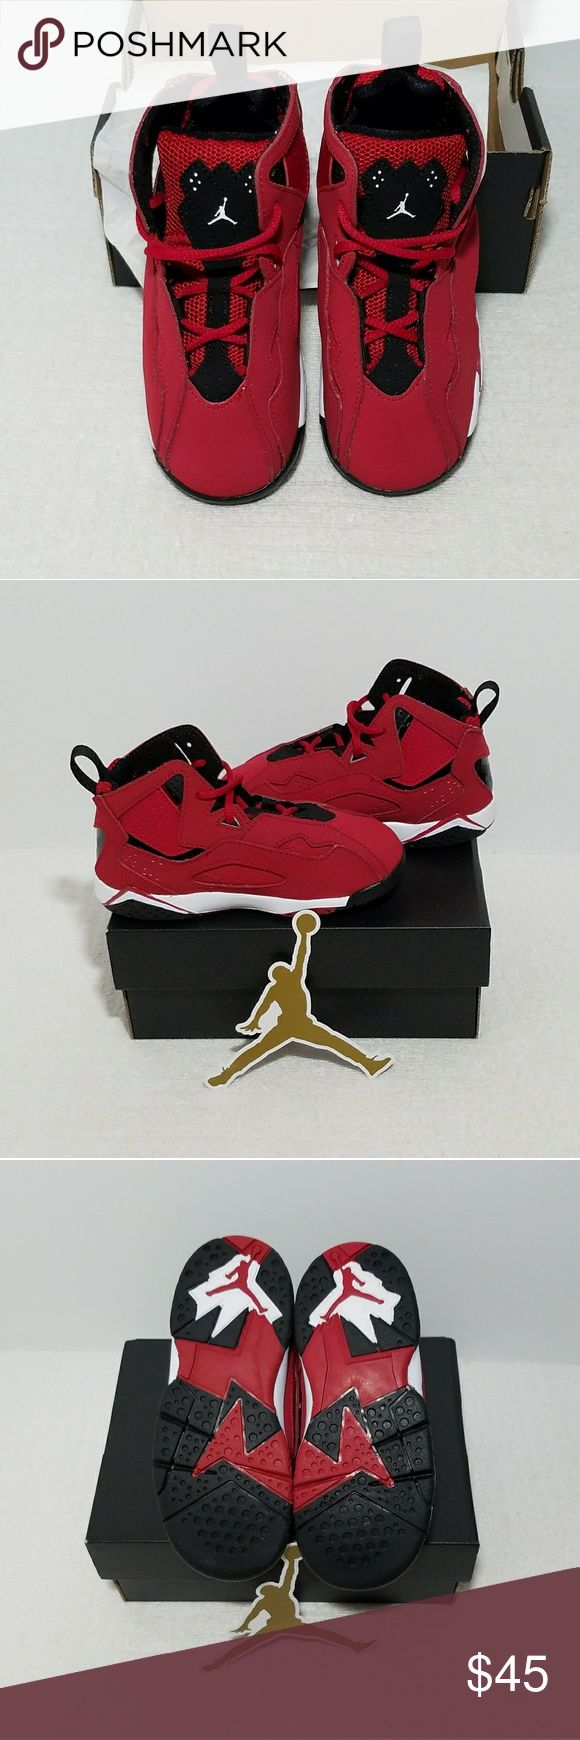 Nike Jordan Flight Toddler Boys Sneakers New Nike Jordan Toddler Boys Sneakers Size 10C Jordan Shoes Sneakers